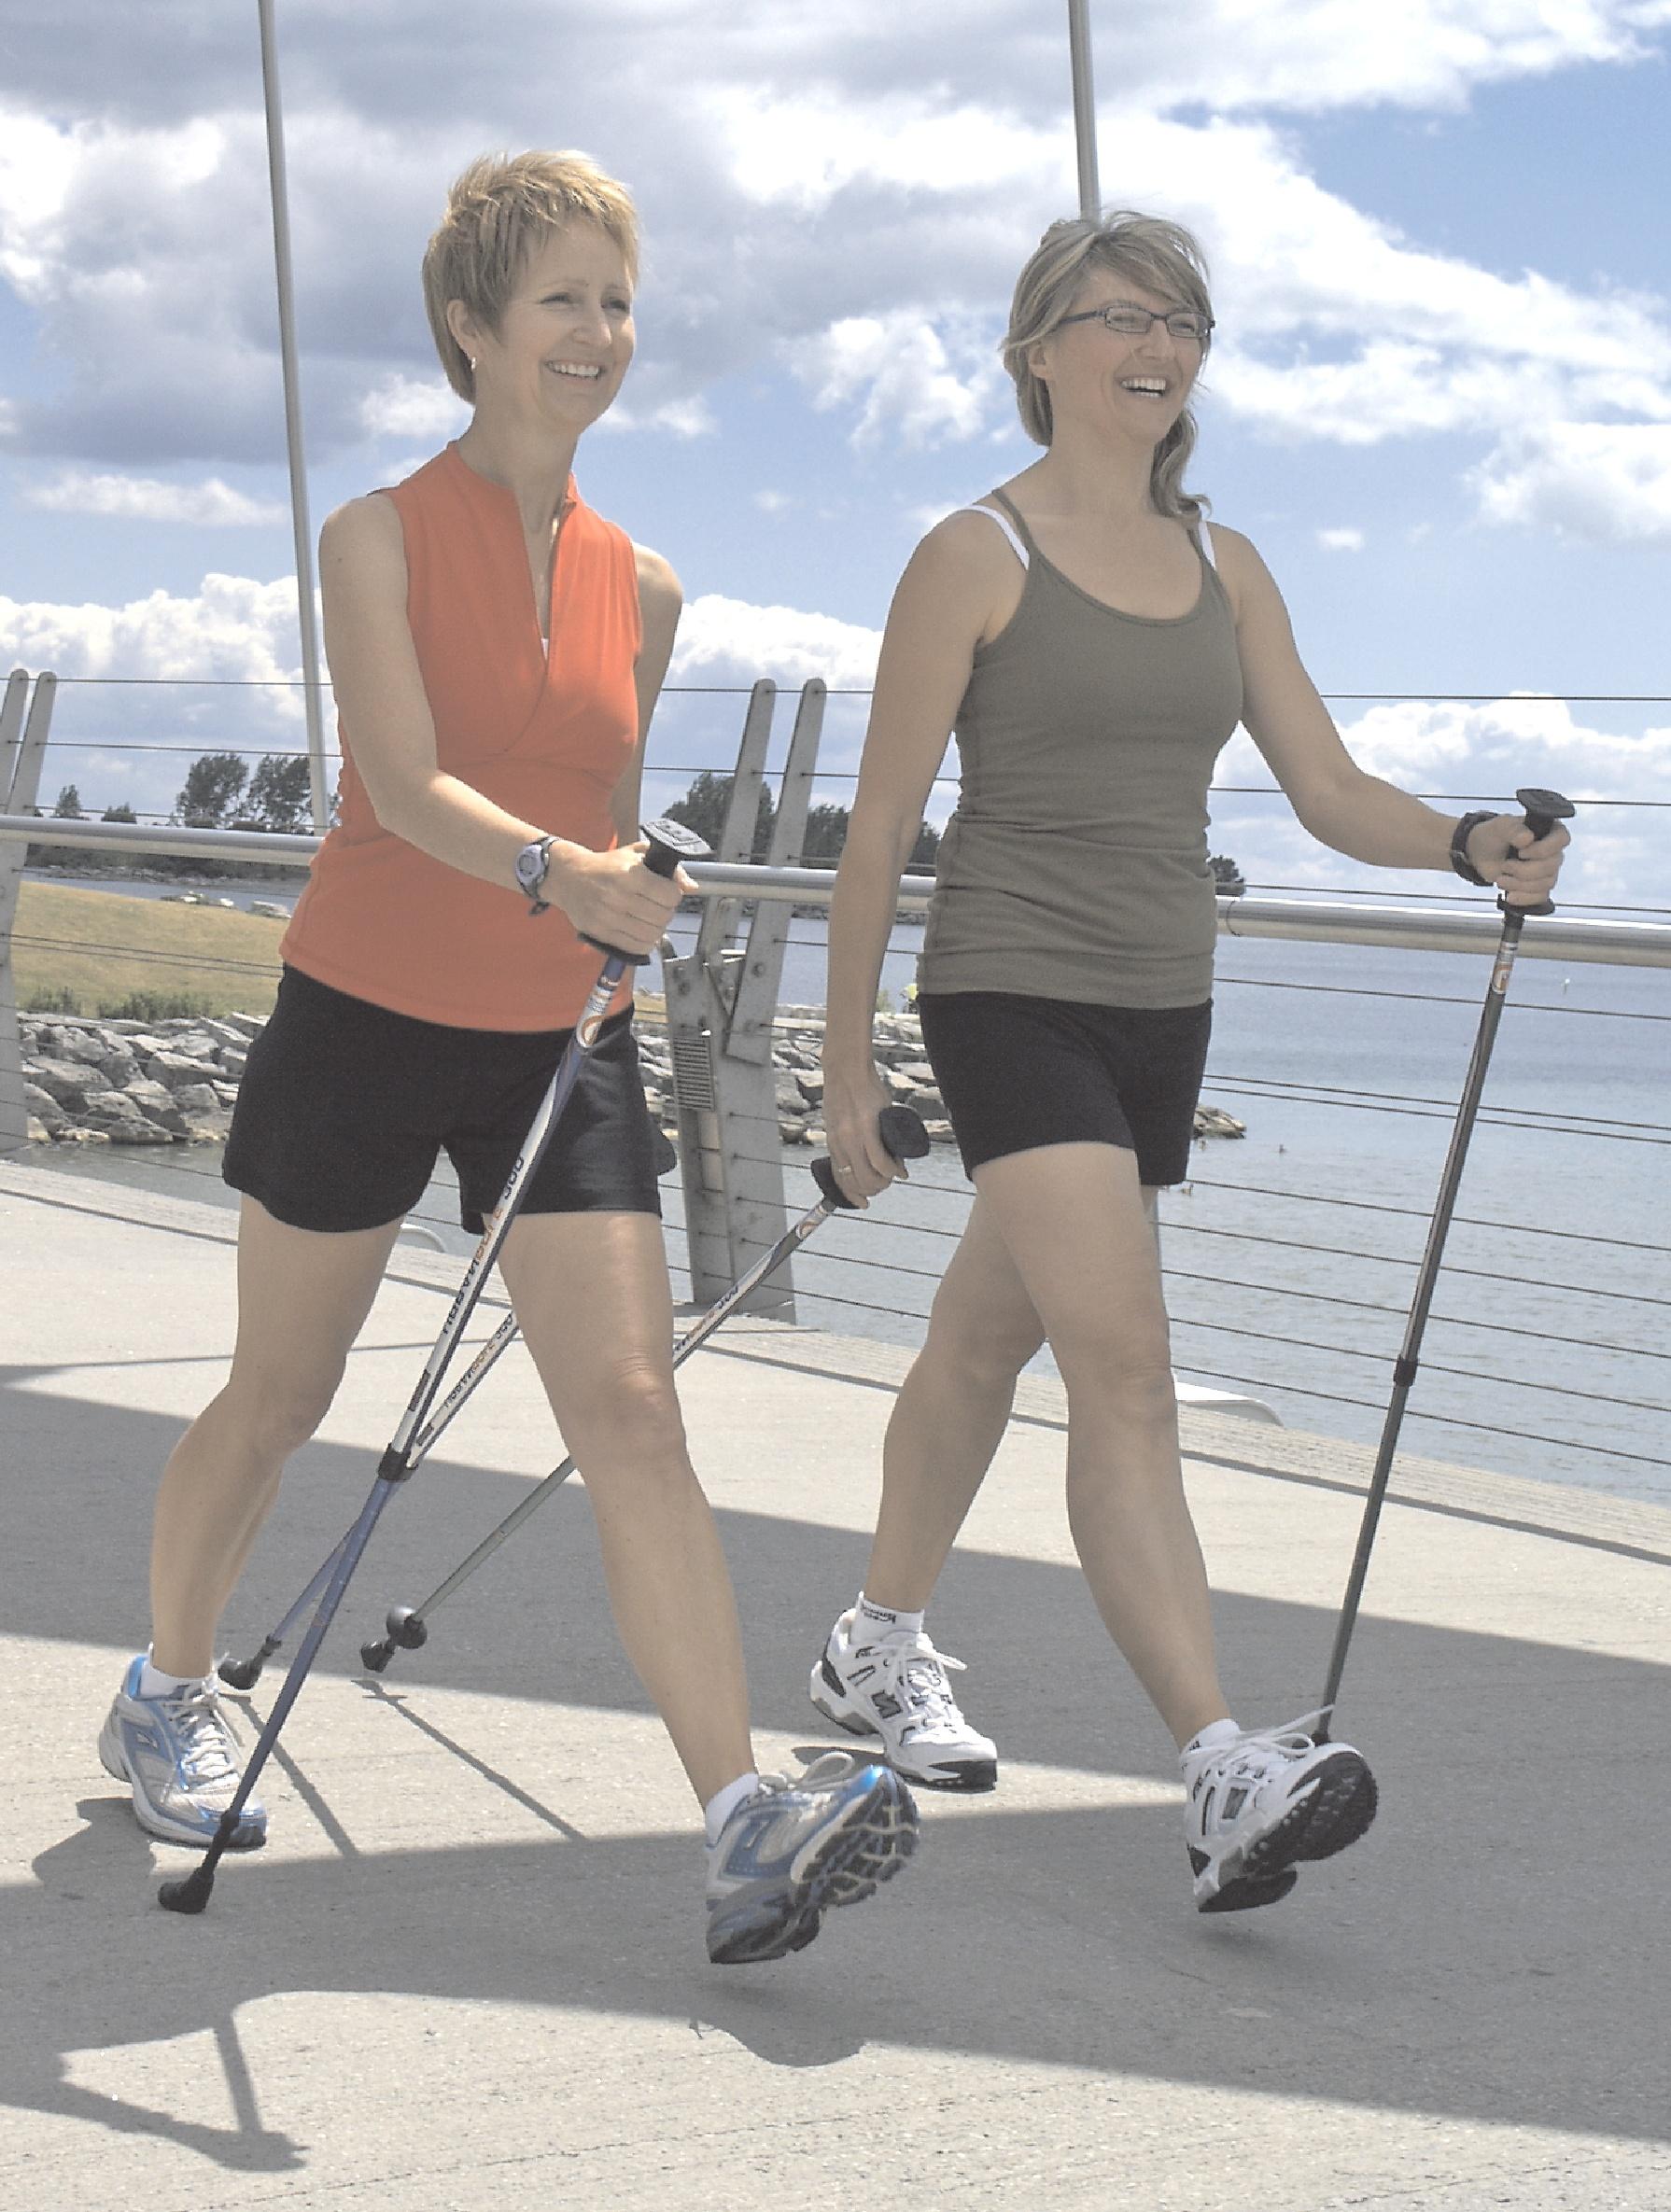 2 women walking with nordic poles